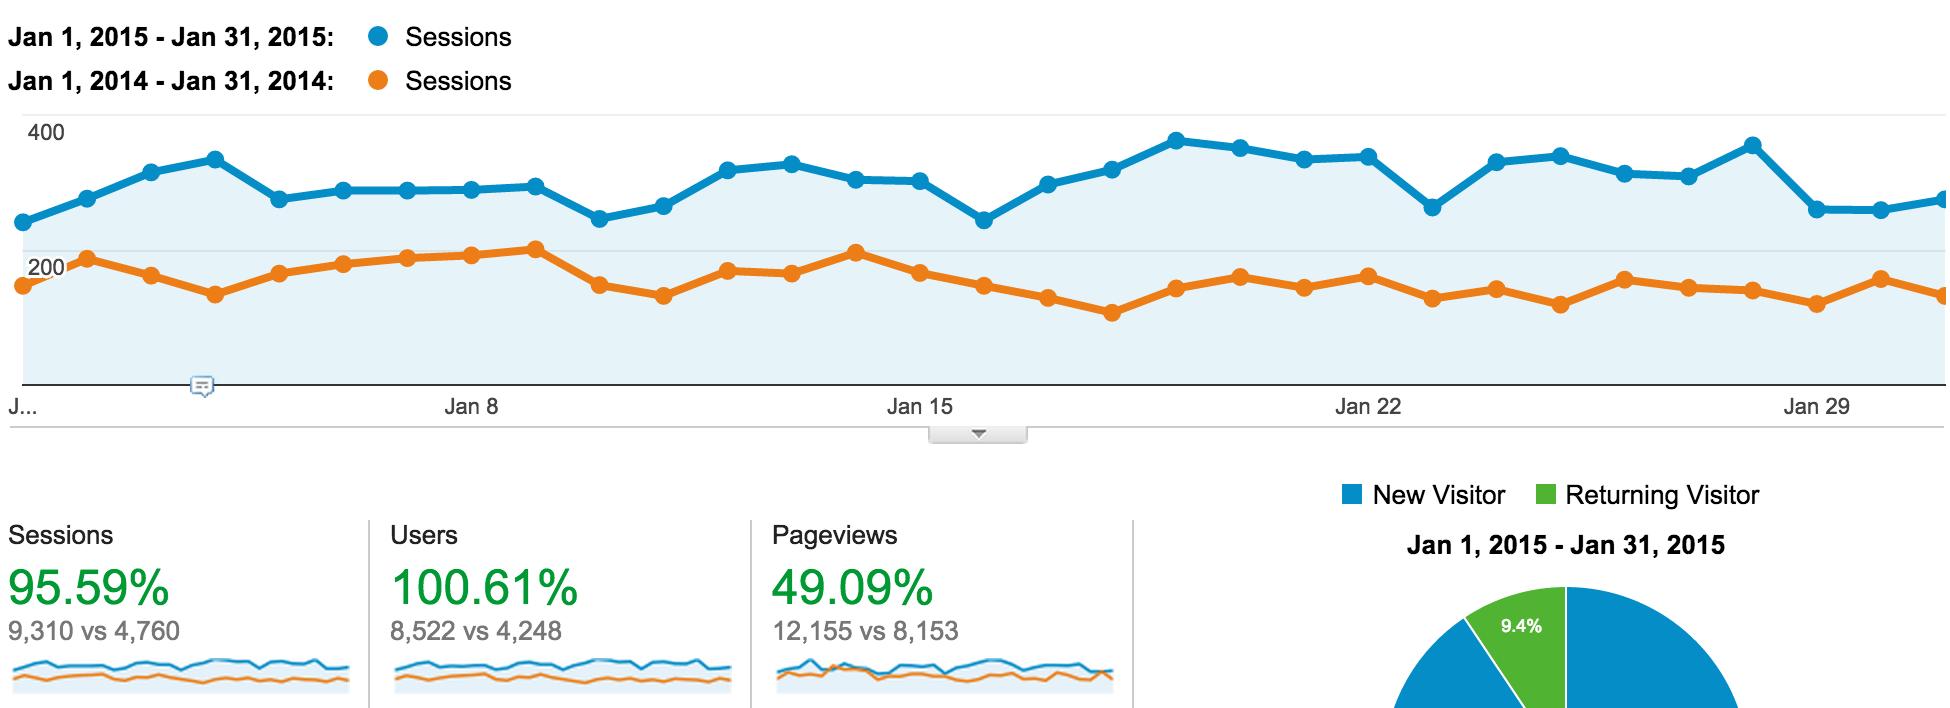 jan14-jan15-traffic-comparison